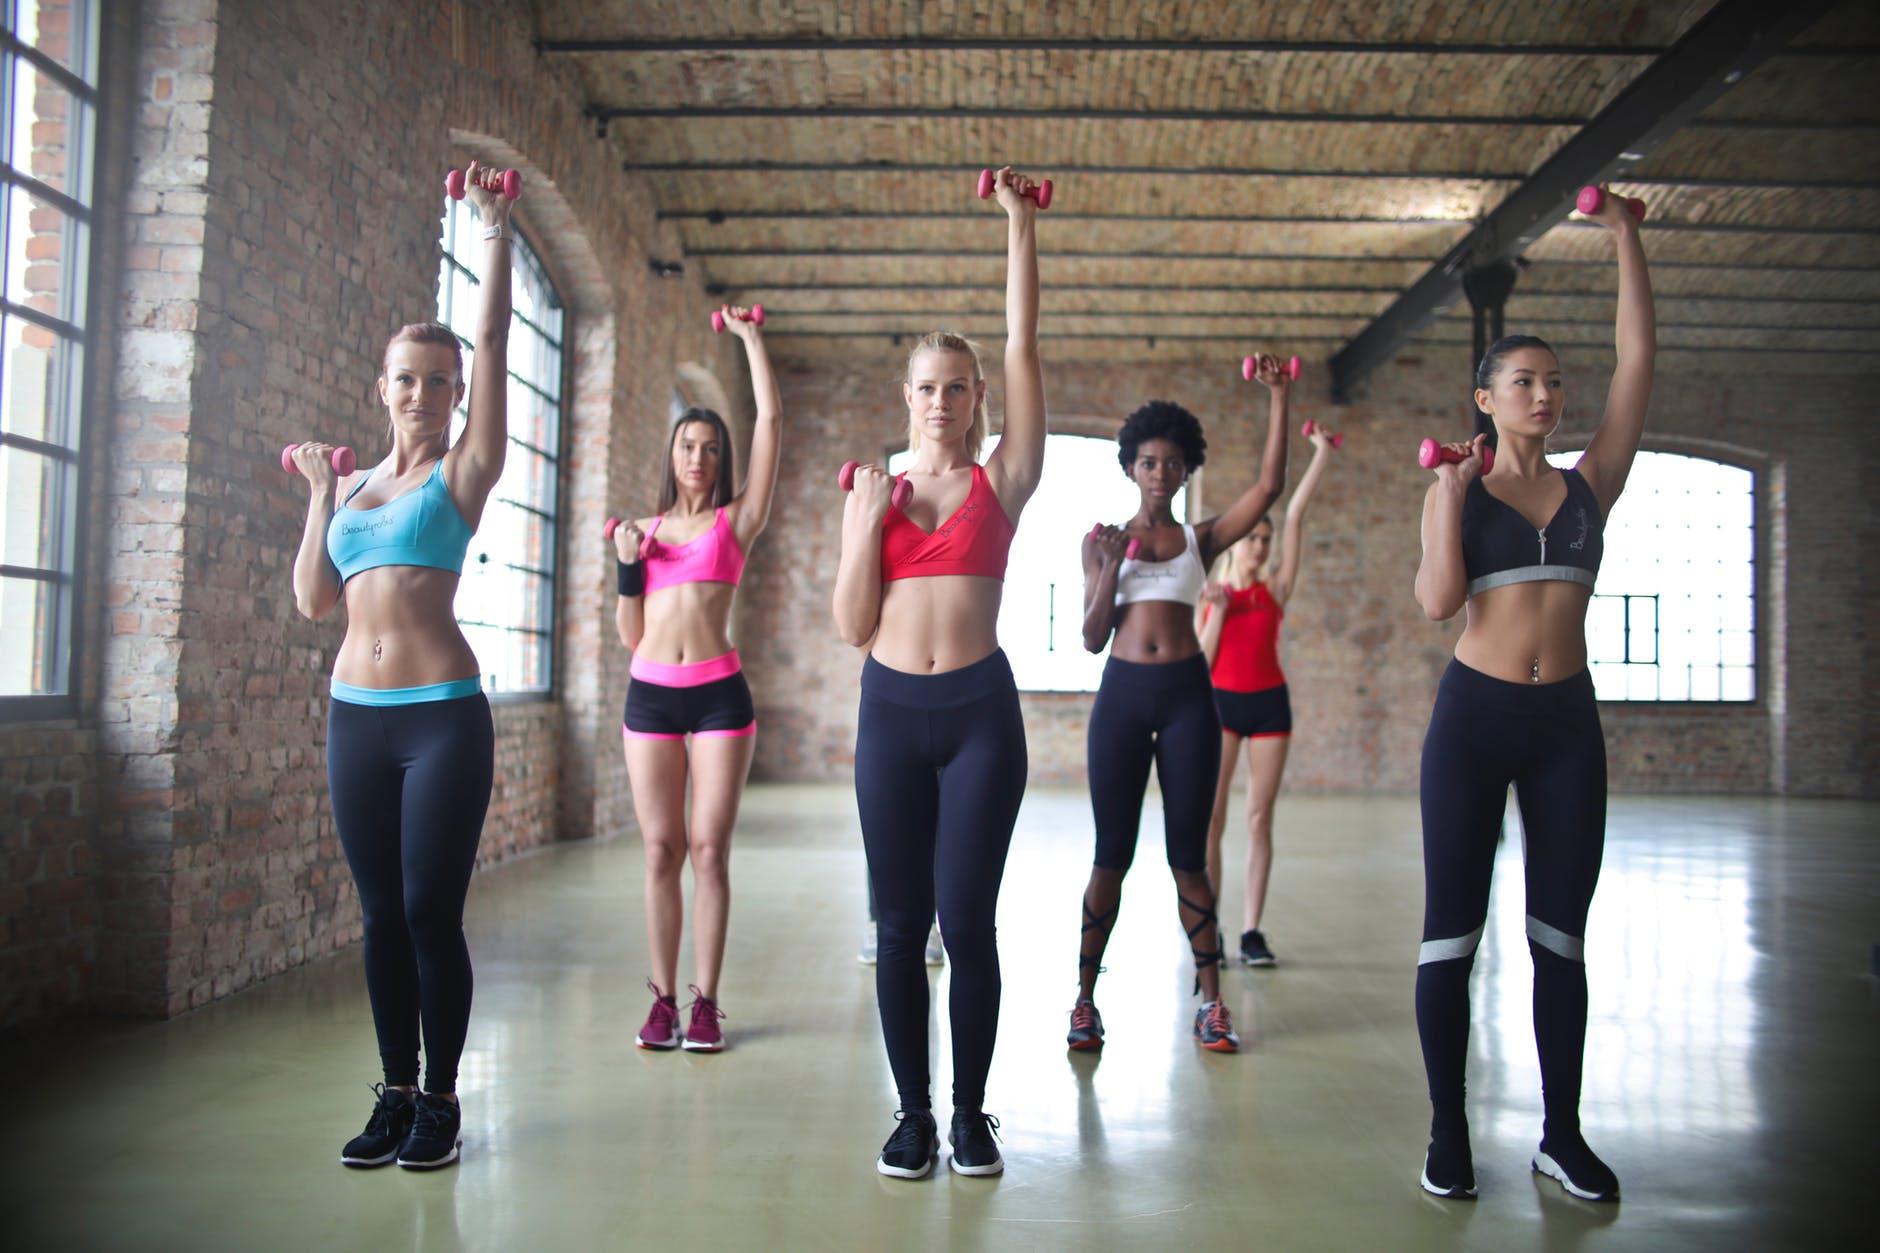 women s assorted sports bras raising their pink dumbbells